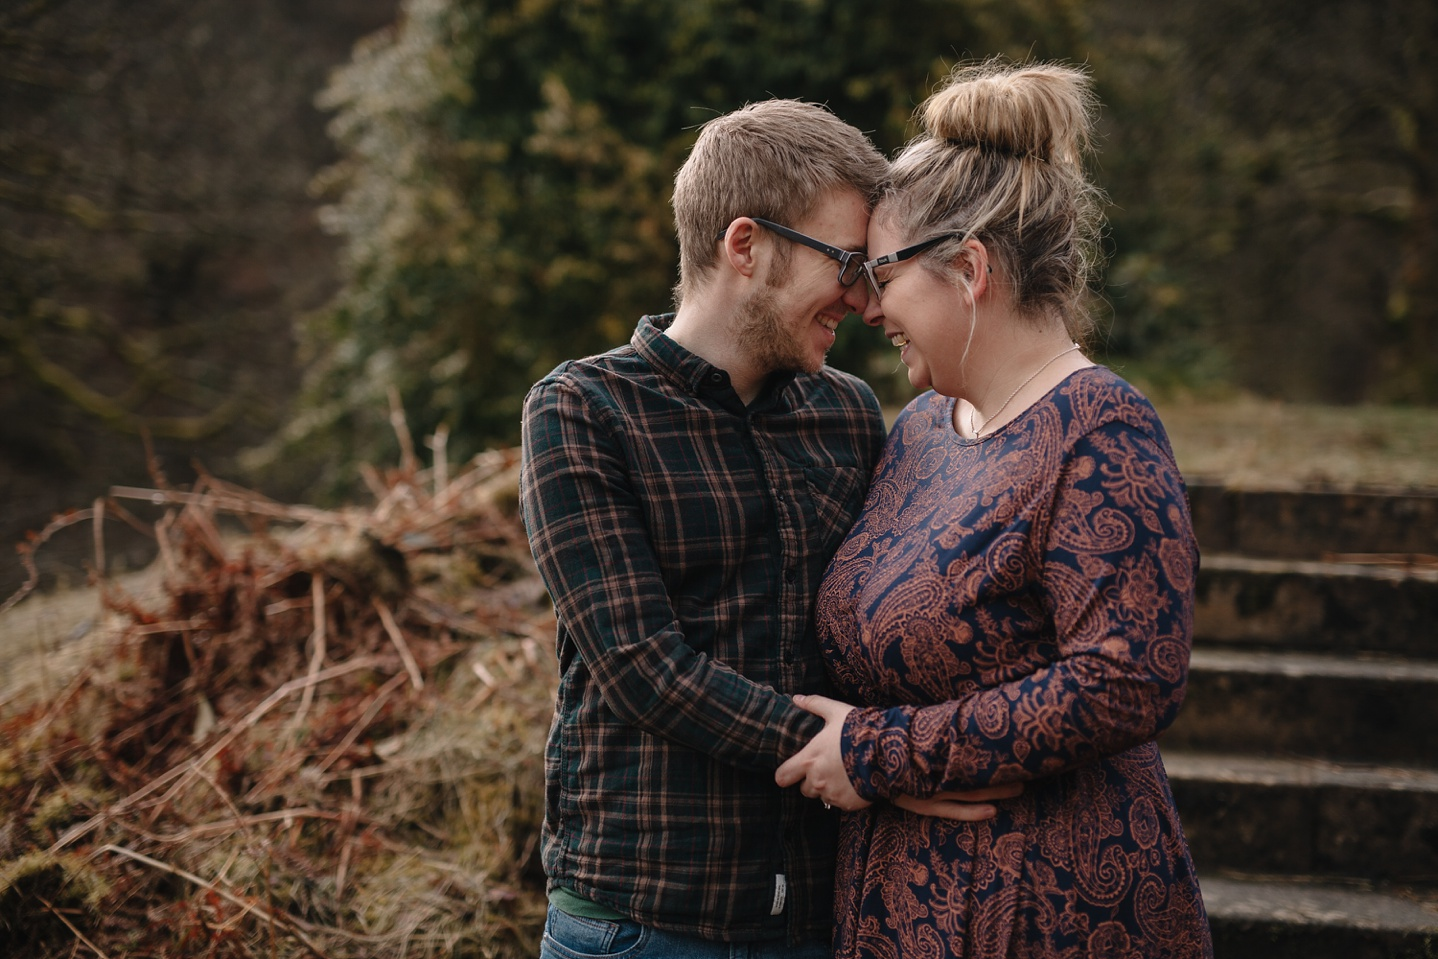 man and woman embracing on the steps of errwood hall